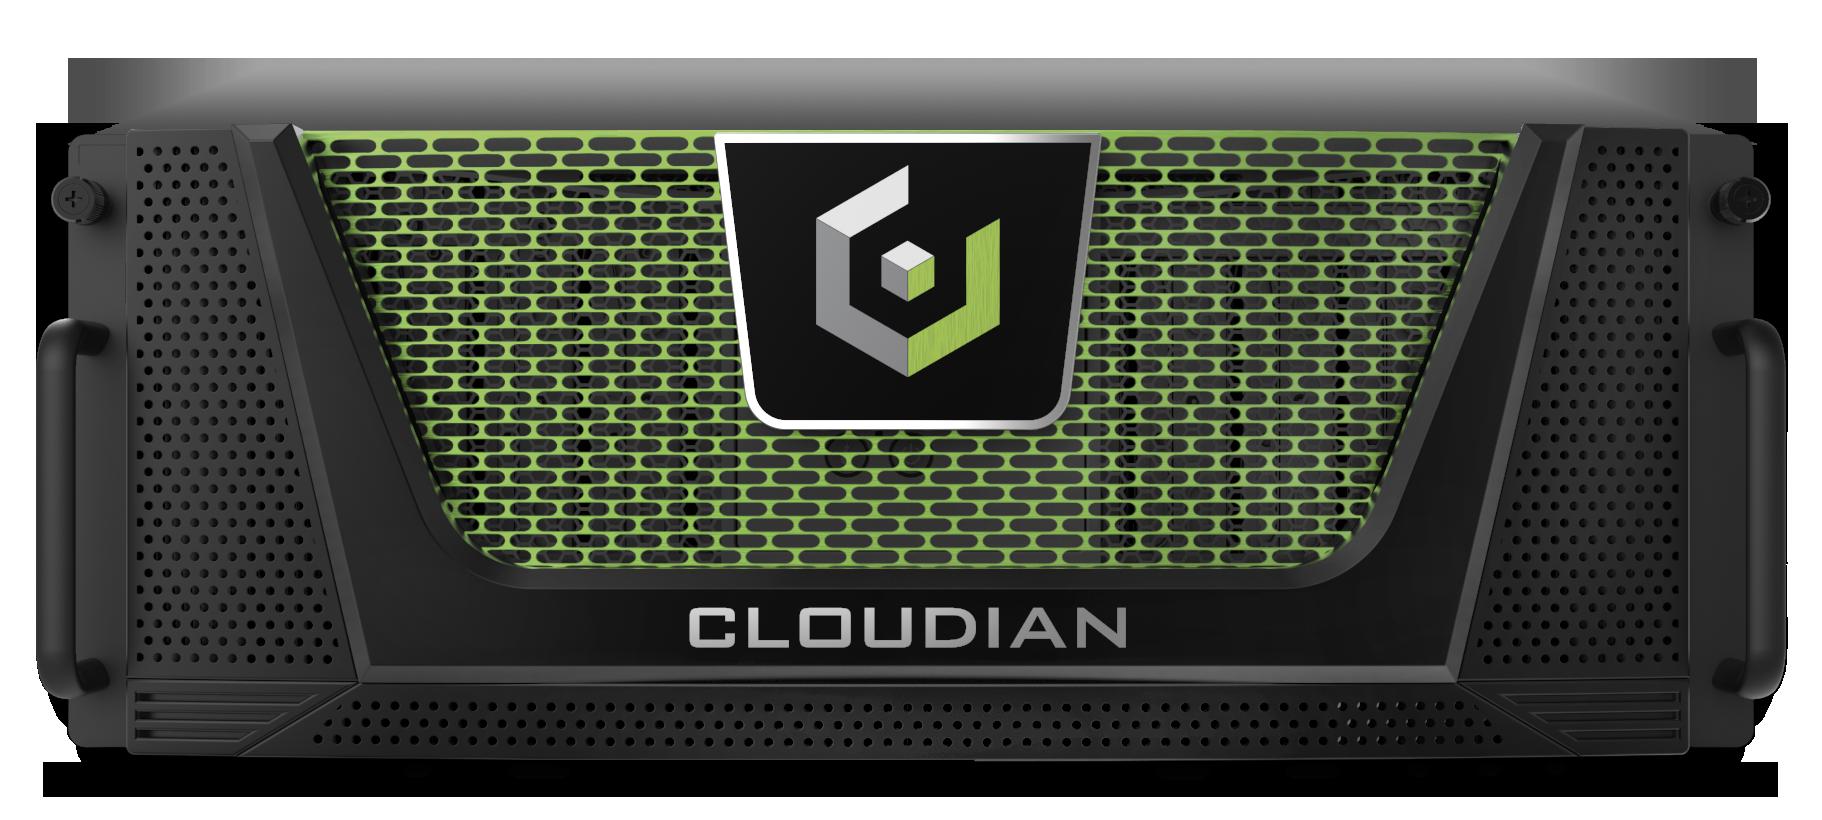 cloudian appliance